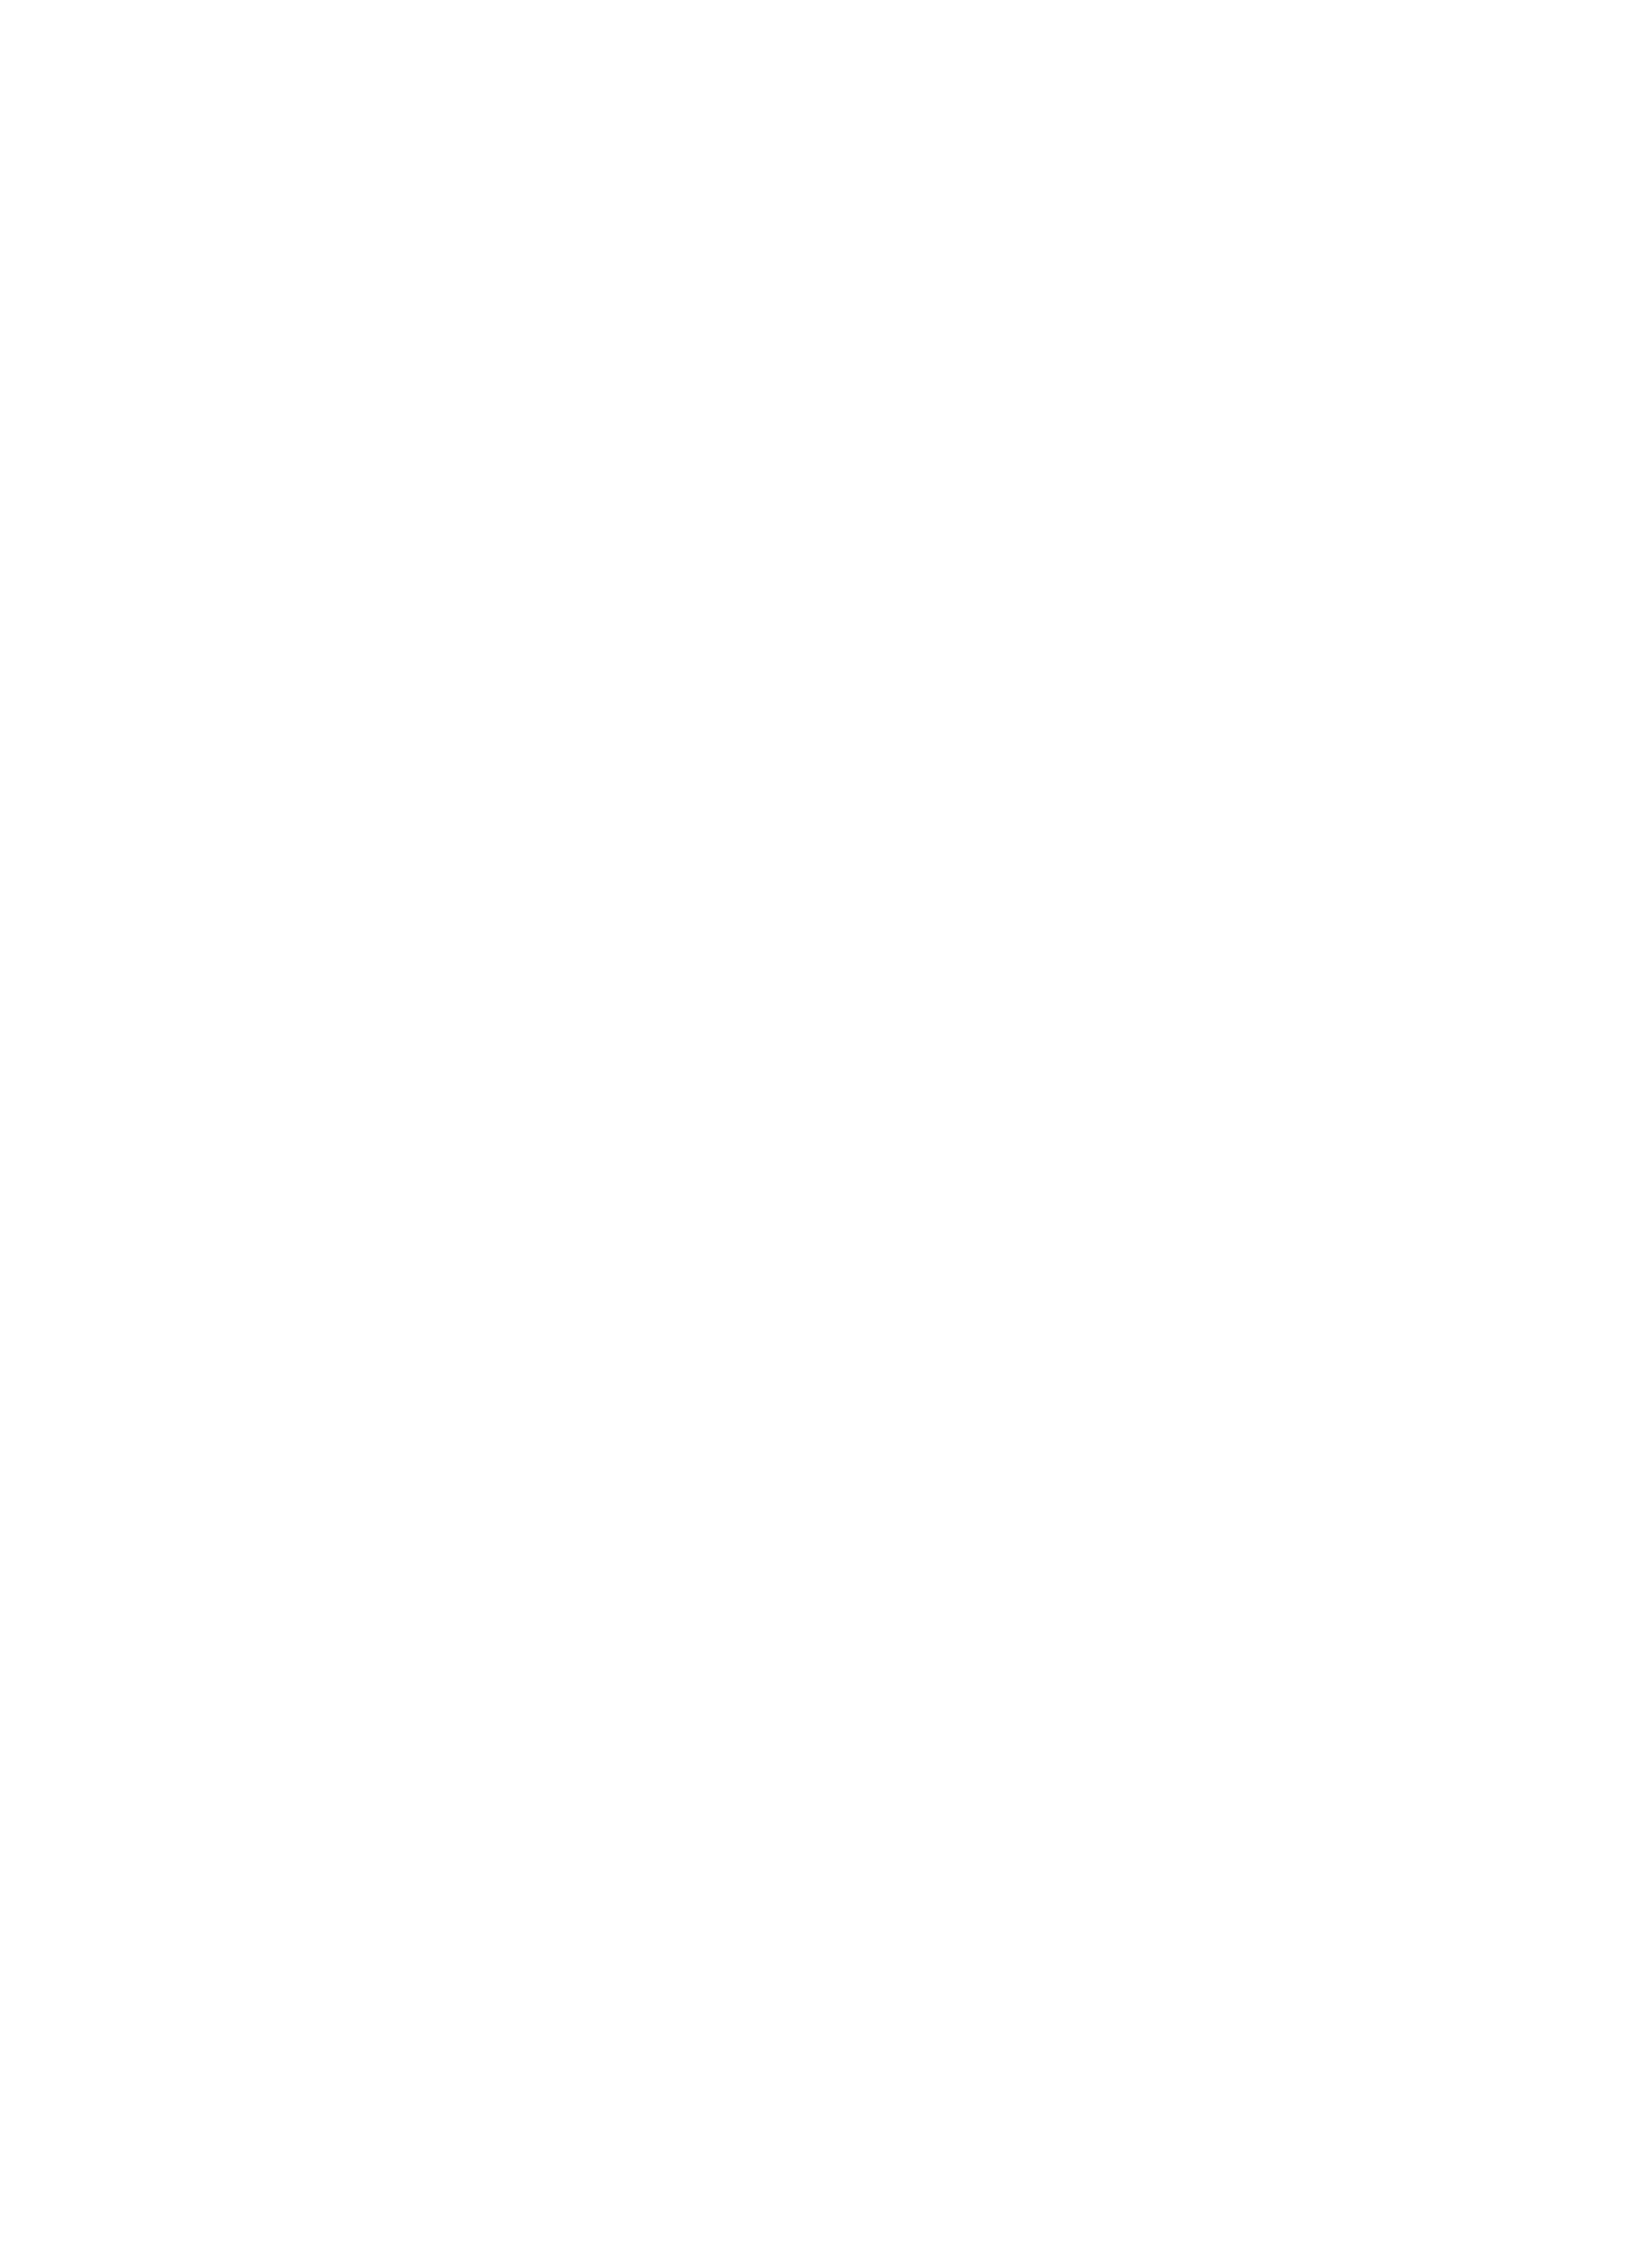 RAUCA Ingeniería Eficiente - Logo White Vertical